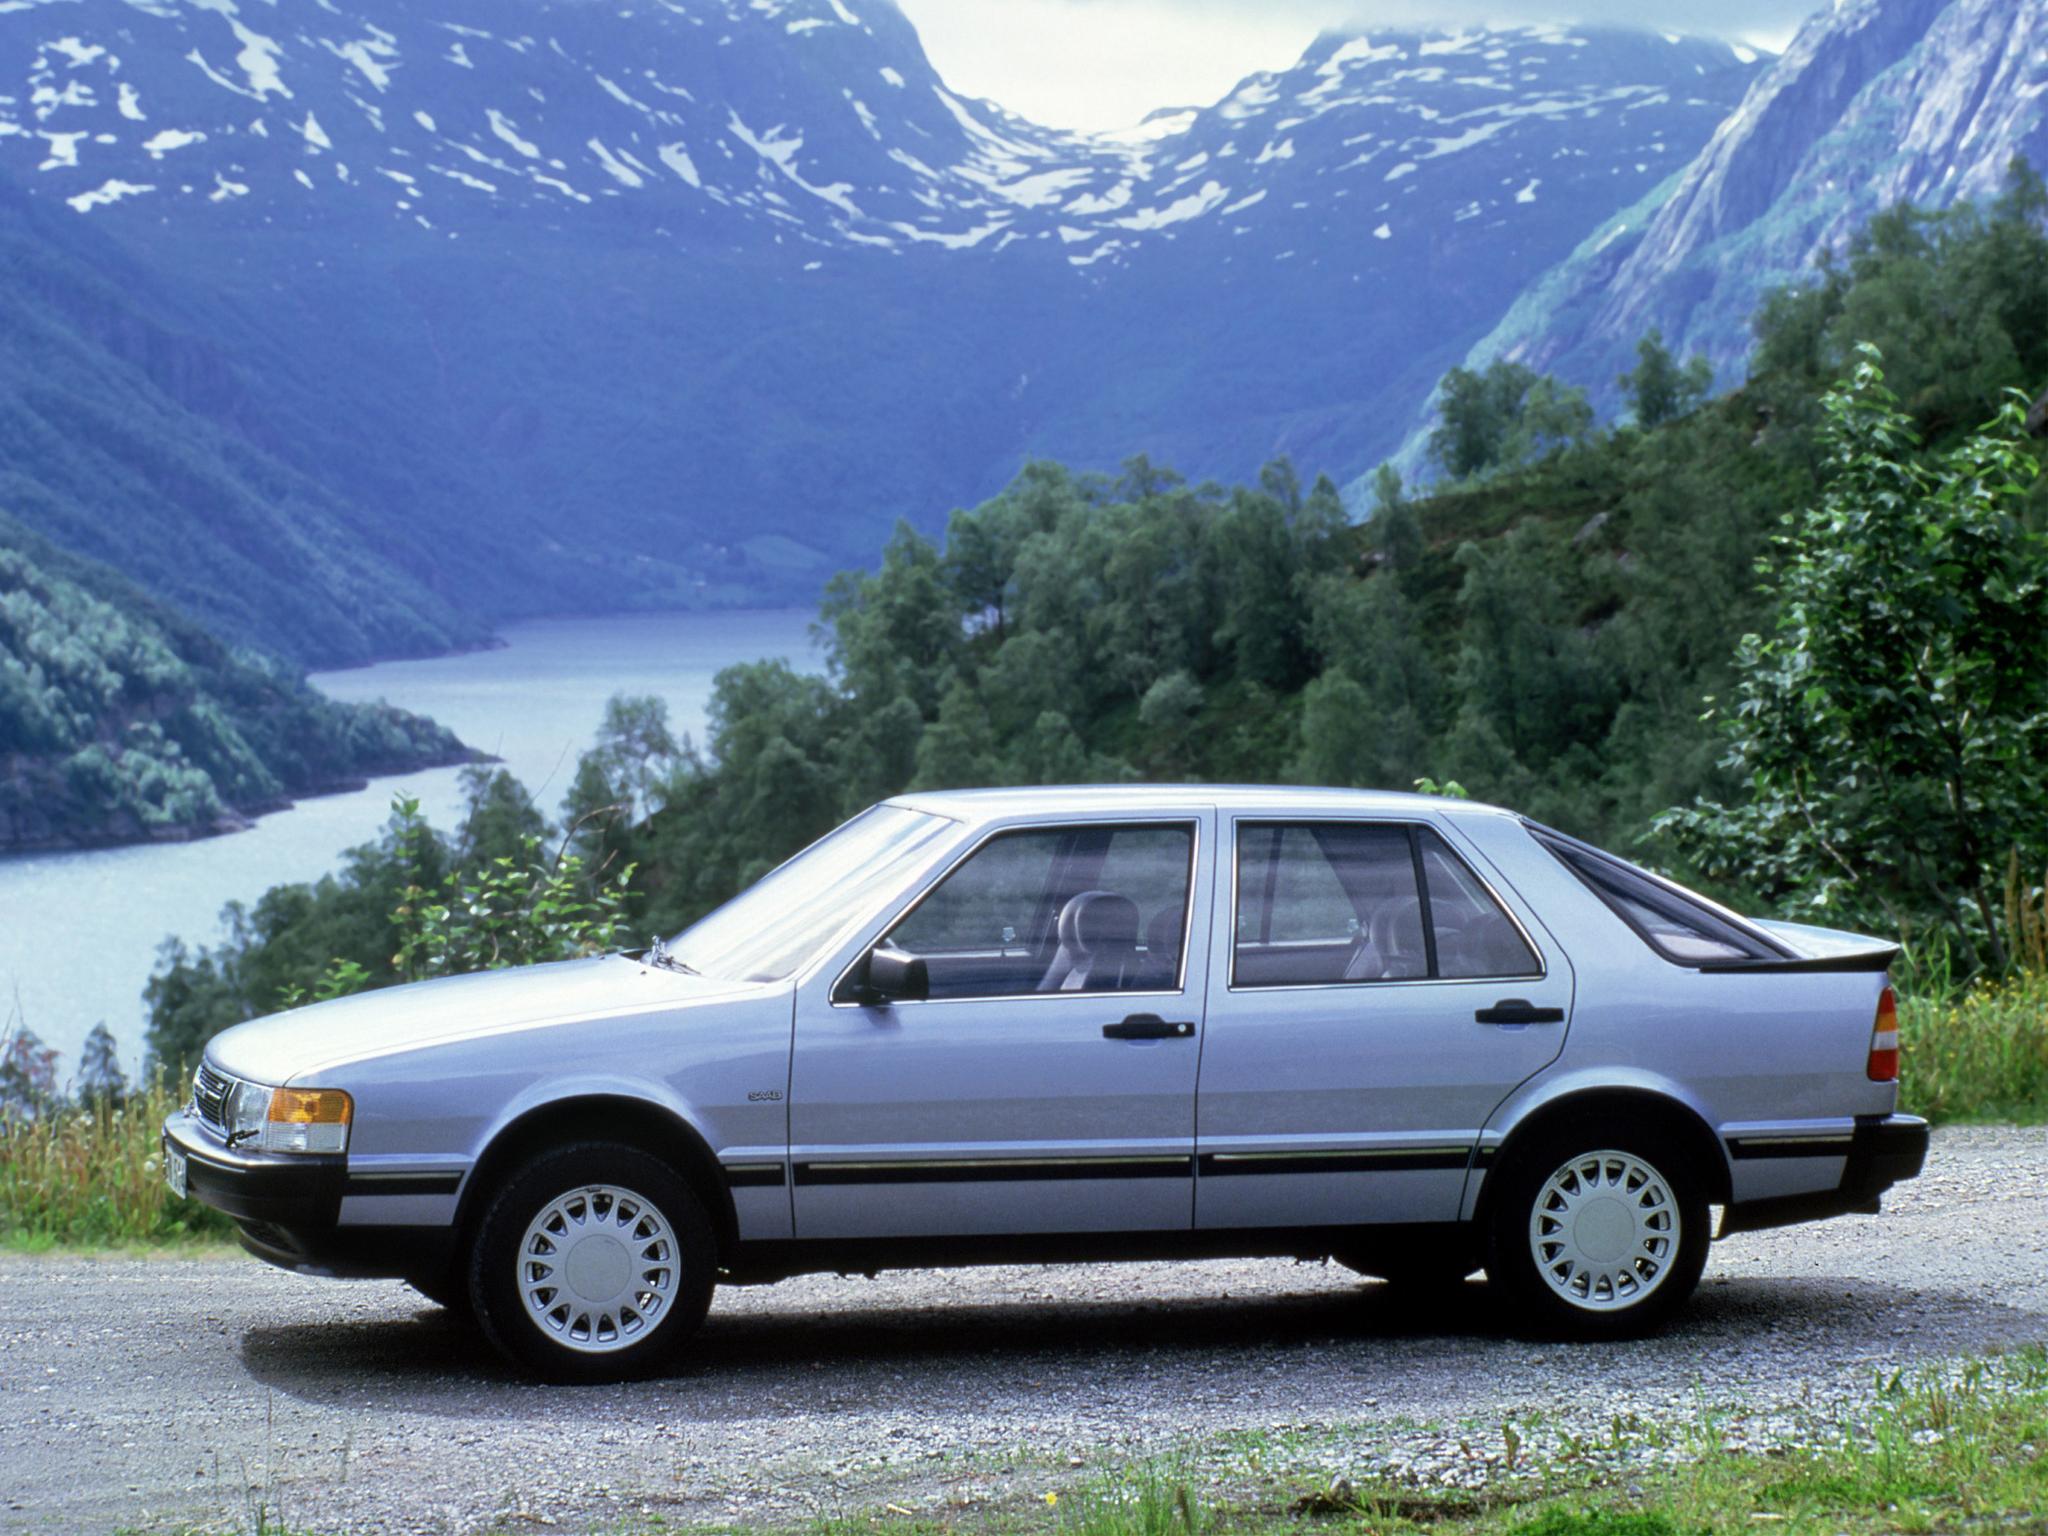 Derivado de Fiat Croma e Alfa 164, o Saab 9000 tinha personalidade